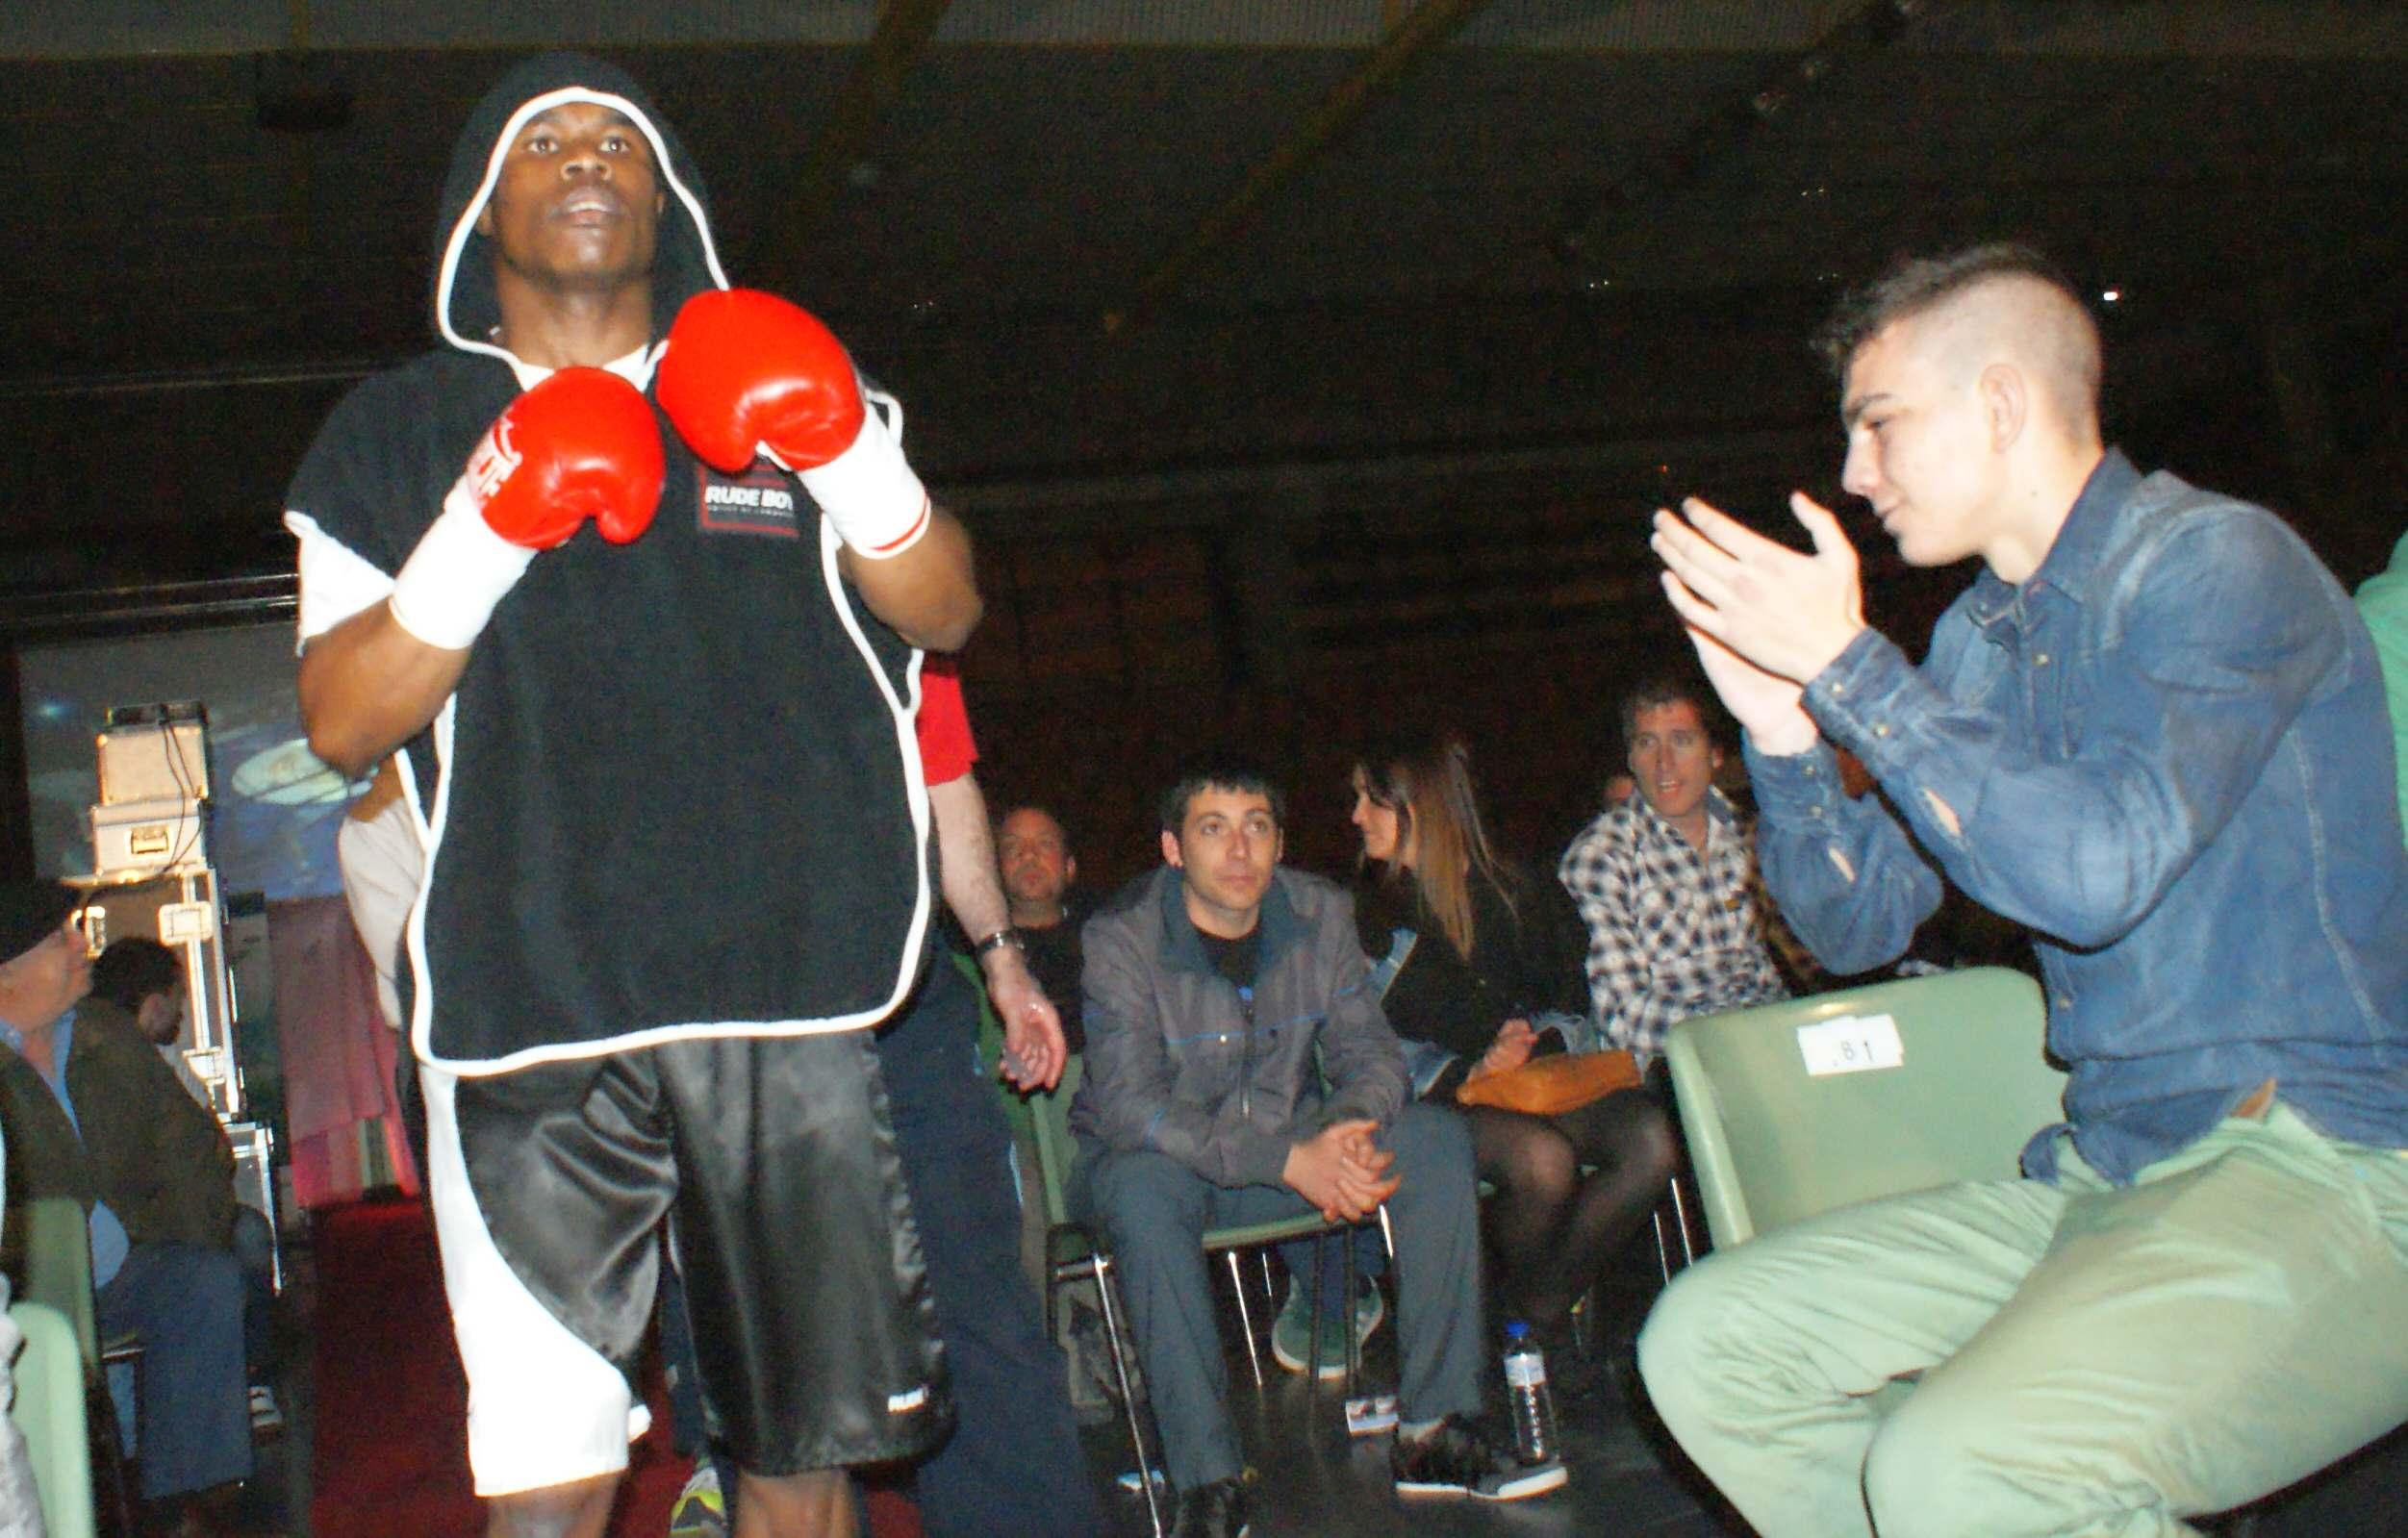 Boxeo profesional en Vitoria Gasteiz: Nacho Mendoza sale al ring entre aplausos.